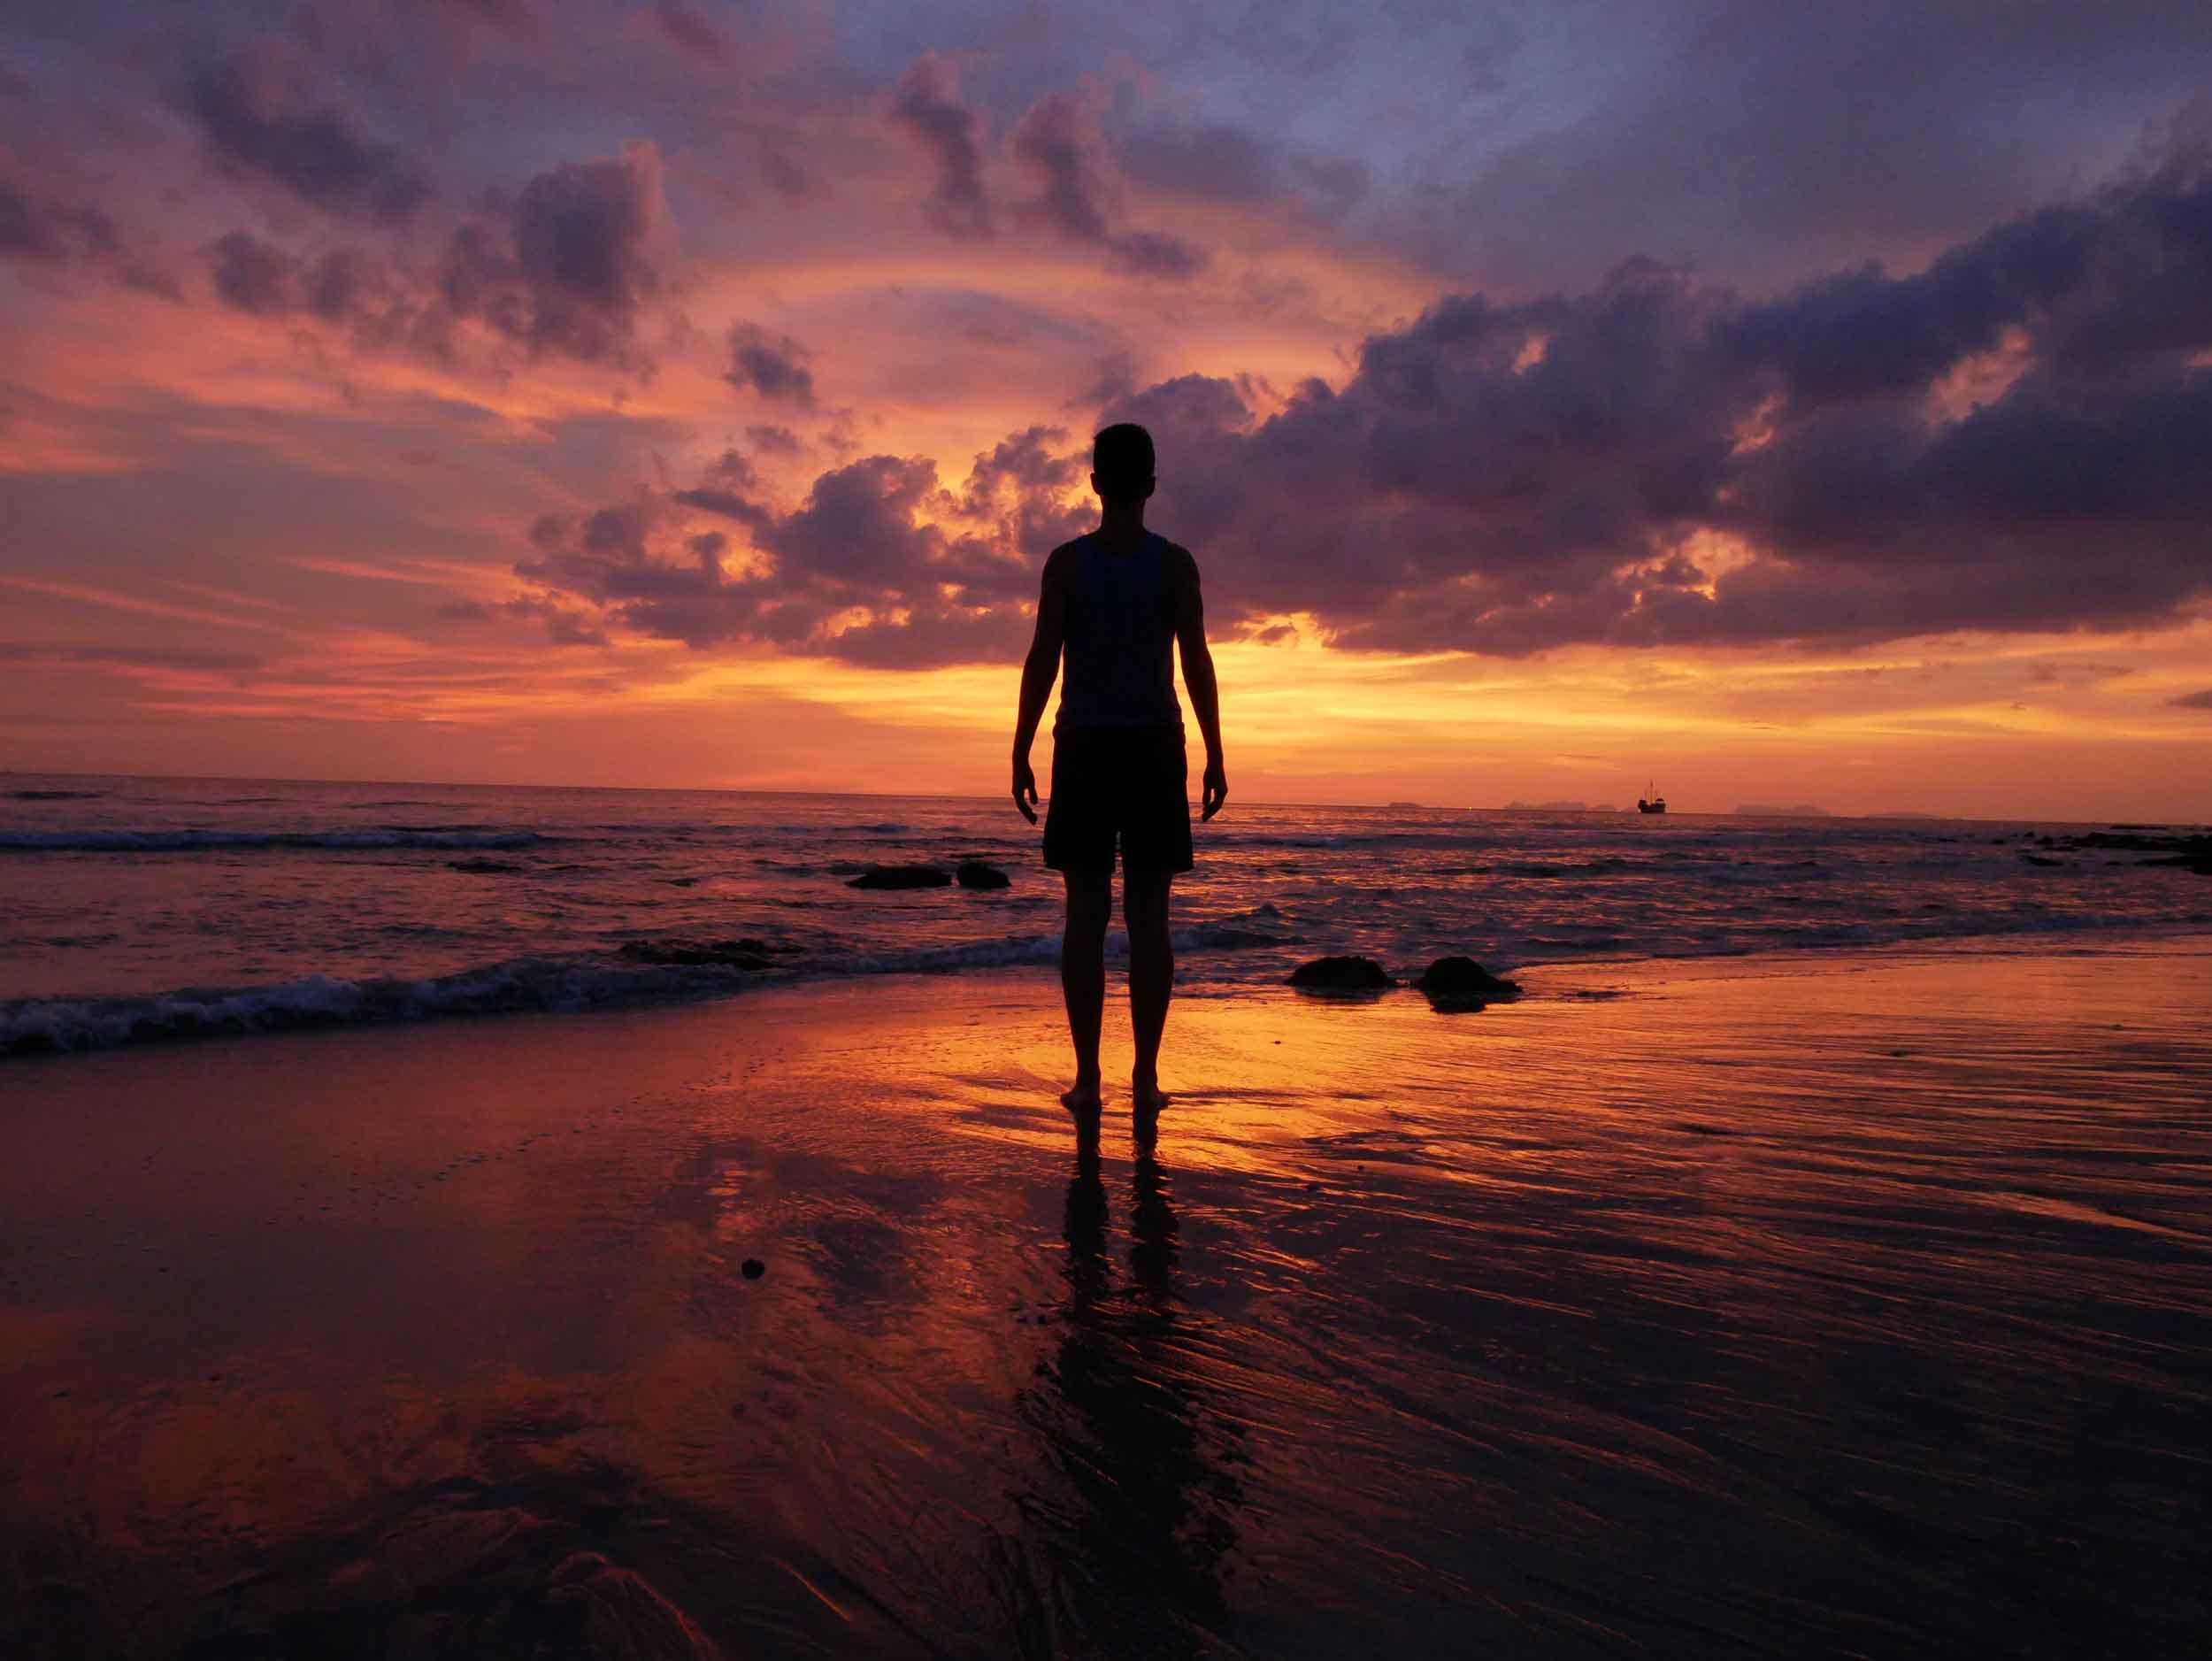 Taking in one of the magical sunsets on Klong Nin Beach, Koh Lanta.